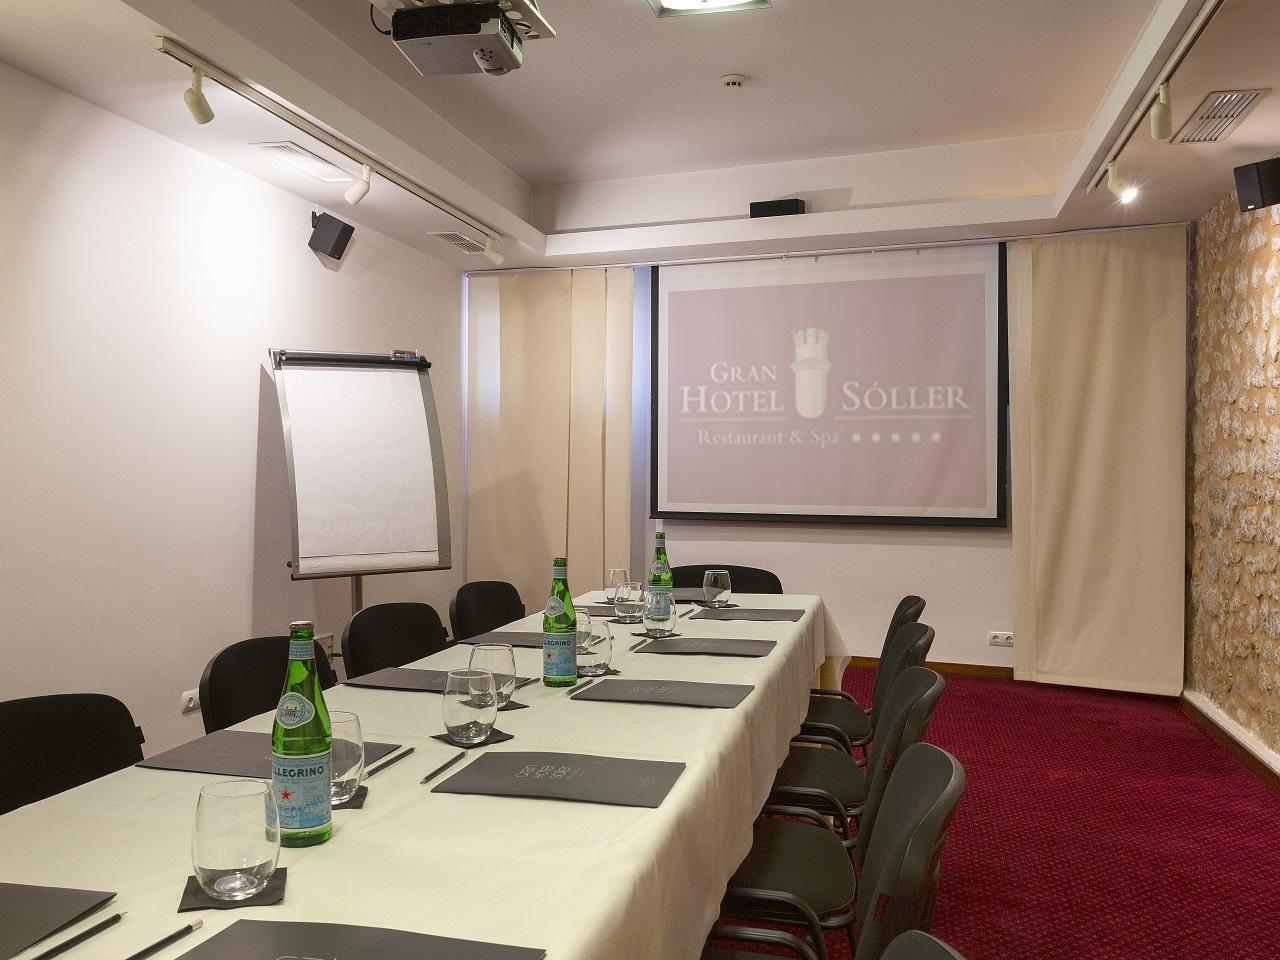 Meeting room at Gran Hotel Sóller in Sóller, Majorca